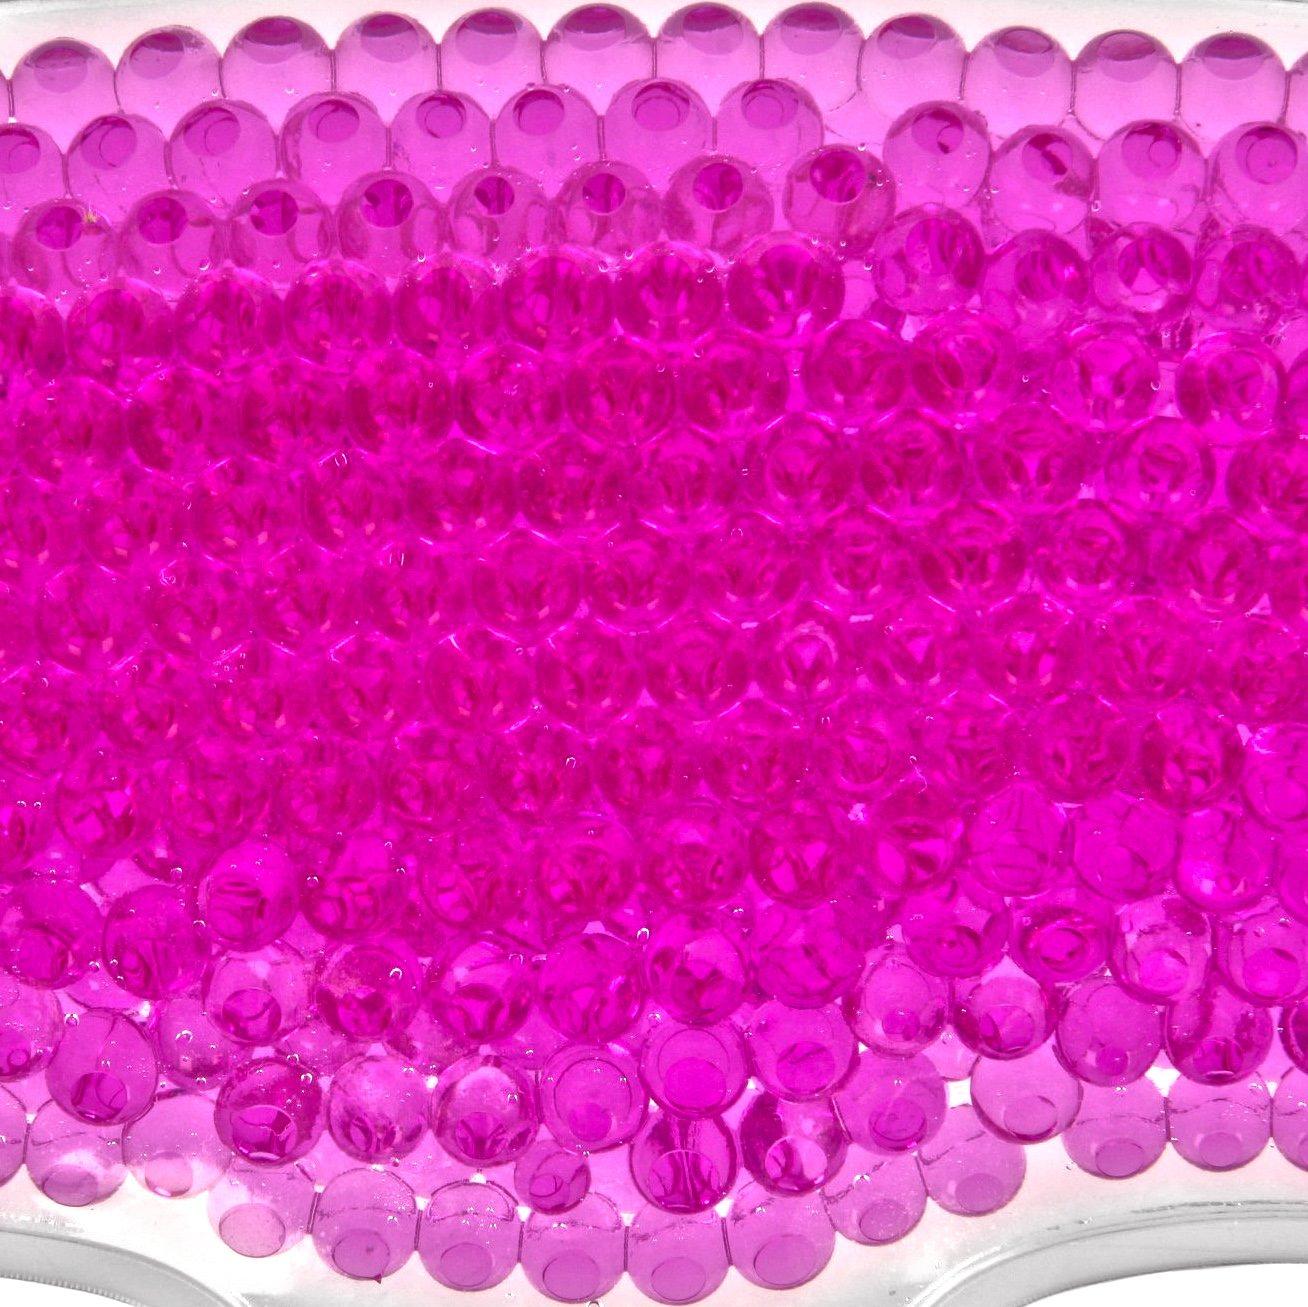 K/ühlende Gesichtsmaske mit rosa Gel-Perlen Migr/änemaske K/ühlmaske Wellnessmaske Entspannungsmaske Gesicht Gesichtskompresse Wasserperlen Cool Face Mask